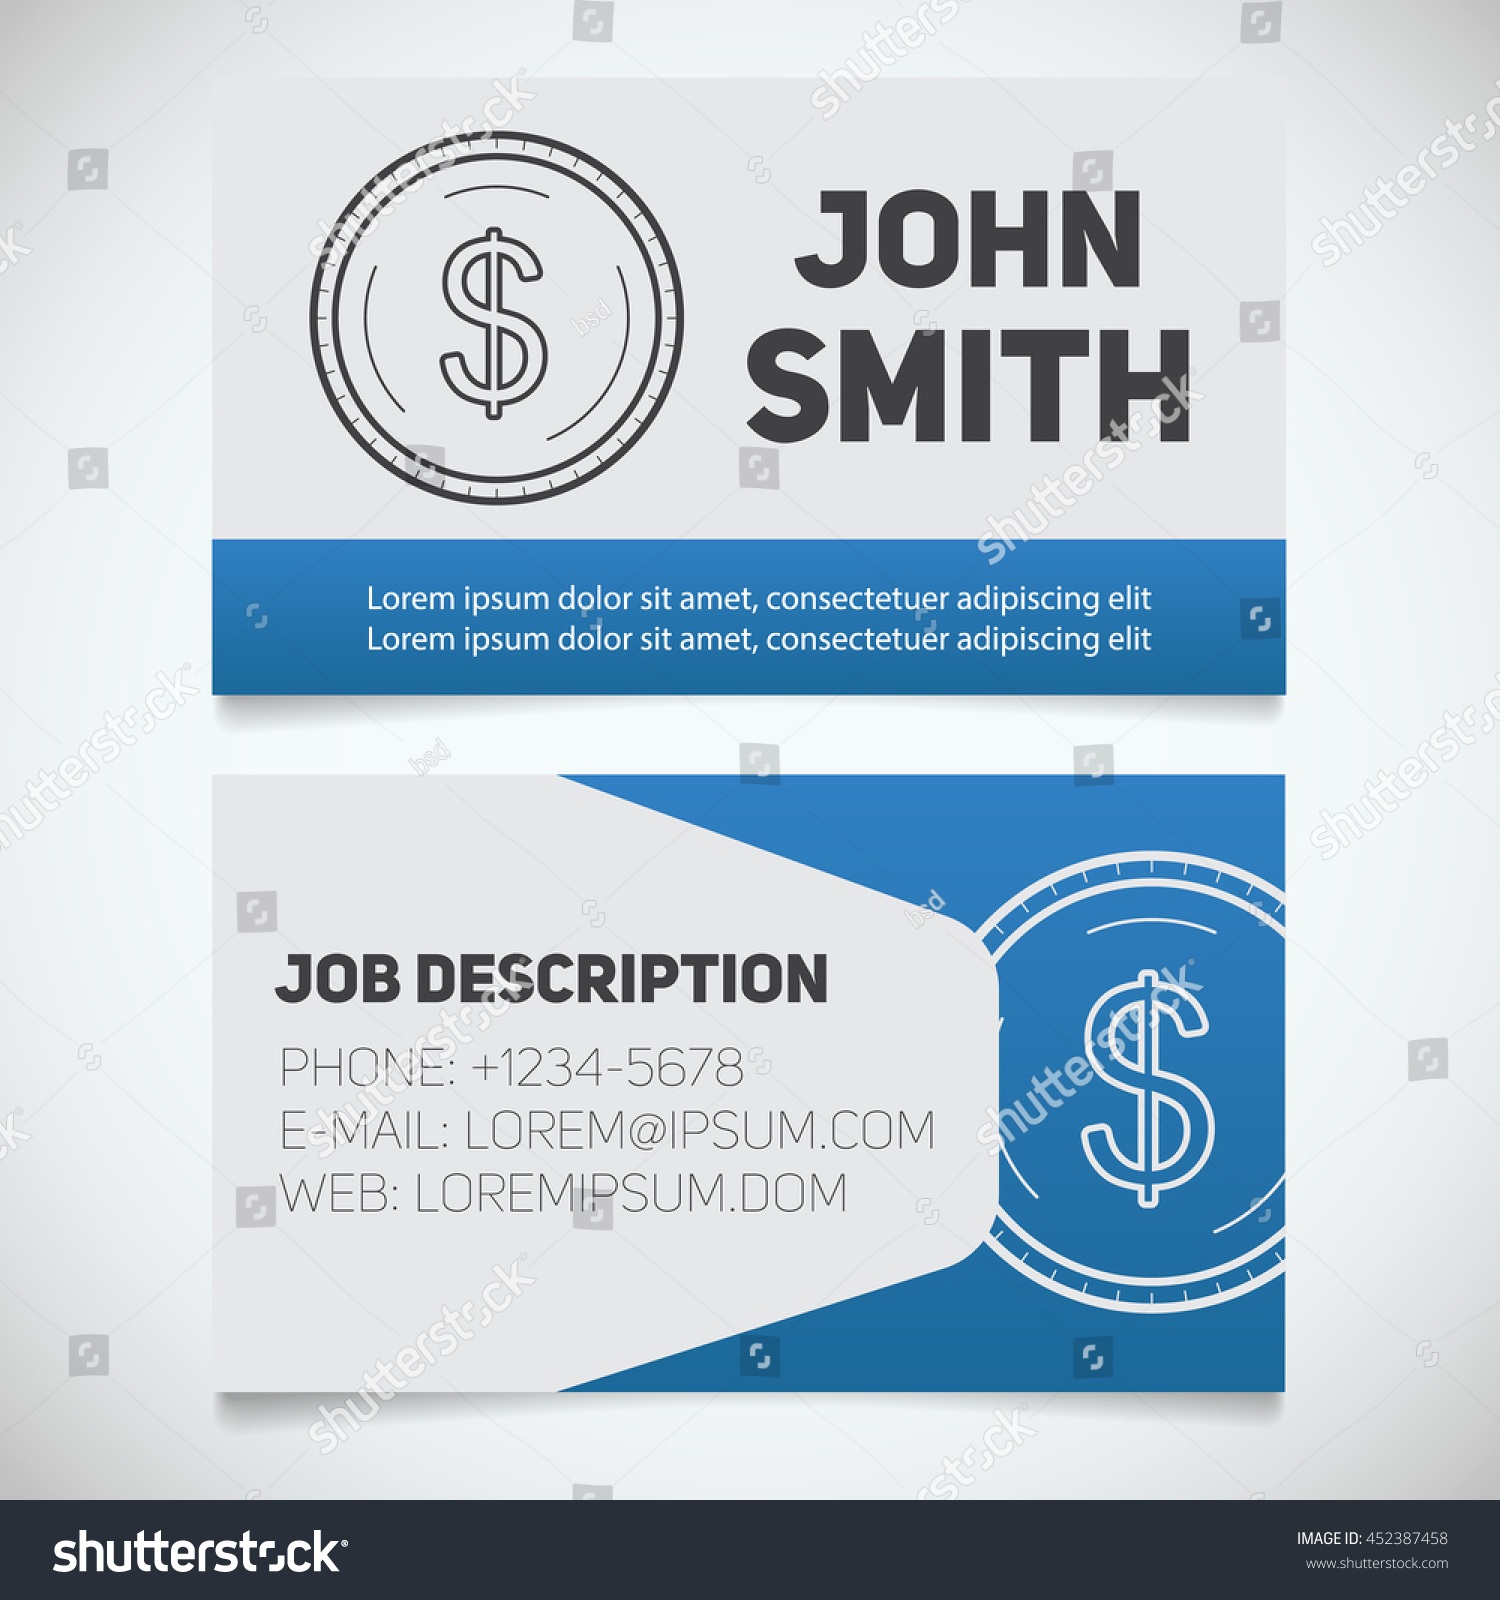 Business card print template dollar coin stock vector 452387458 business card print template with dollar coin logo easy edit accountant bank worker colourmoves